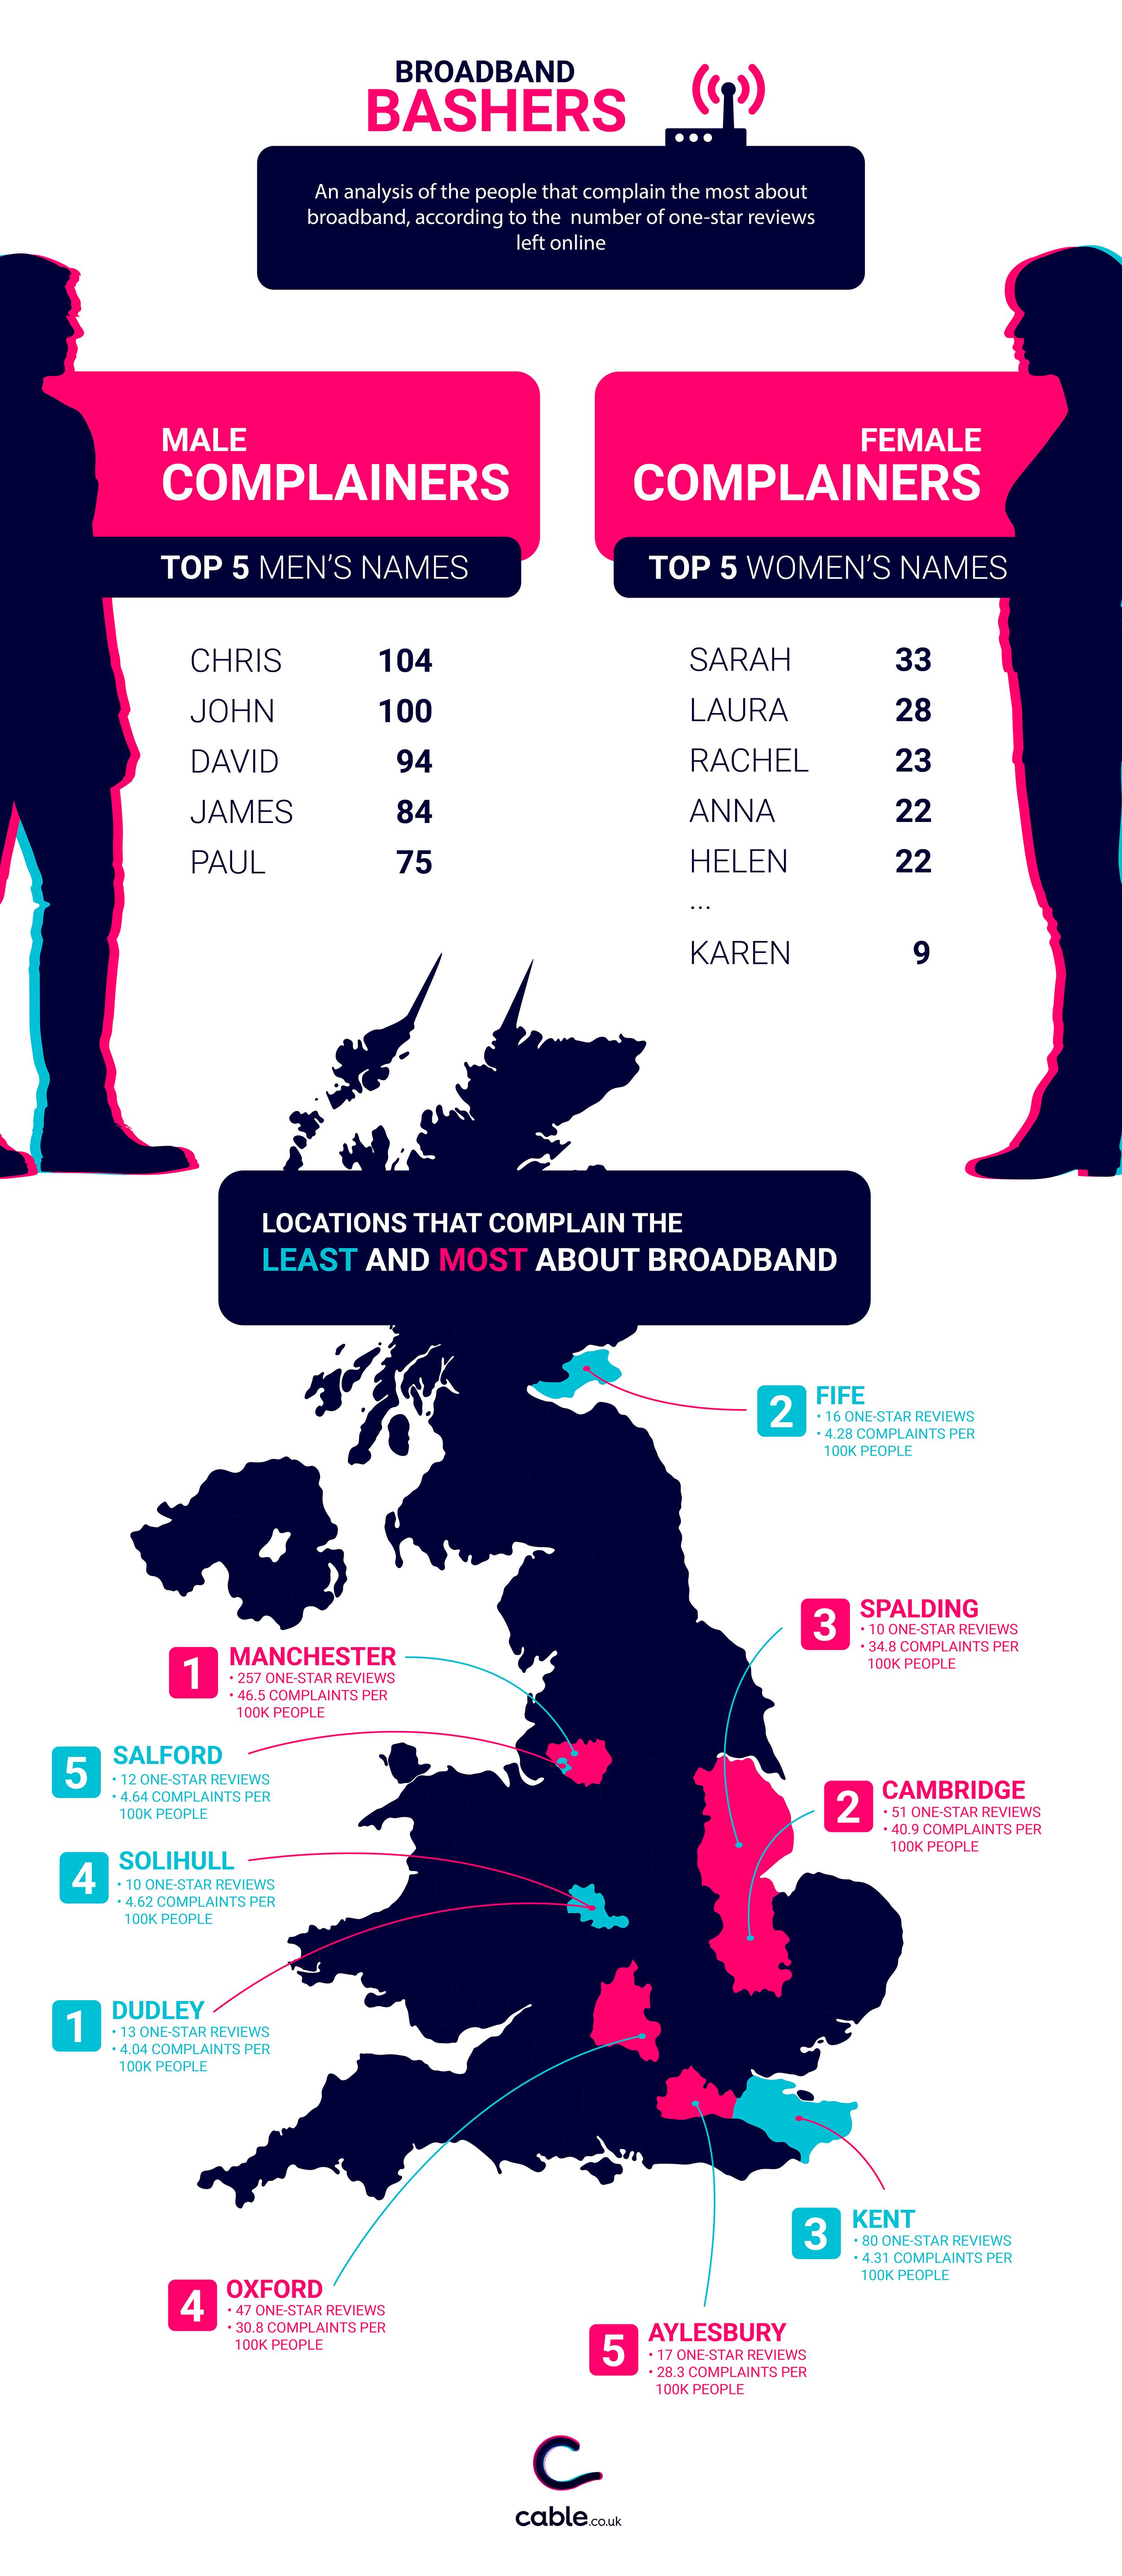 Broadband Bashers infographic